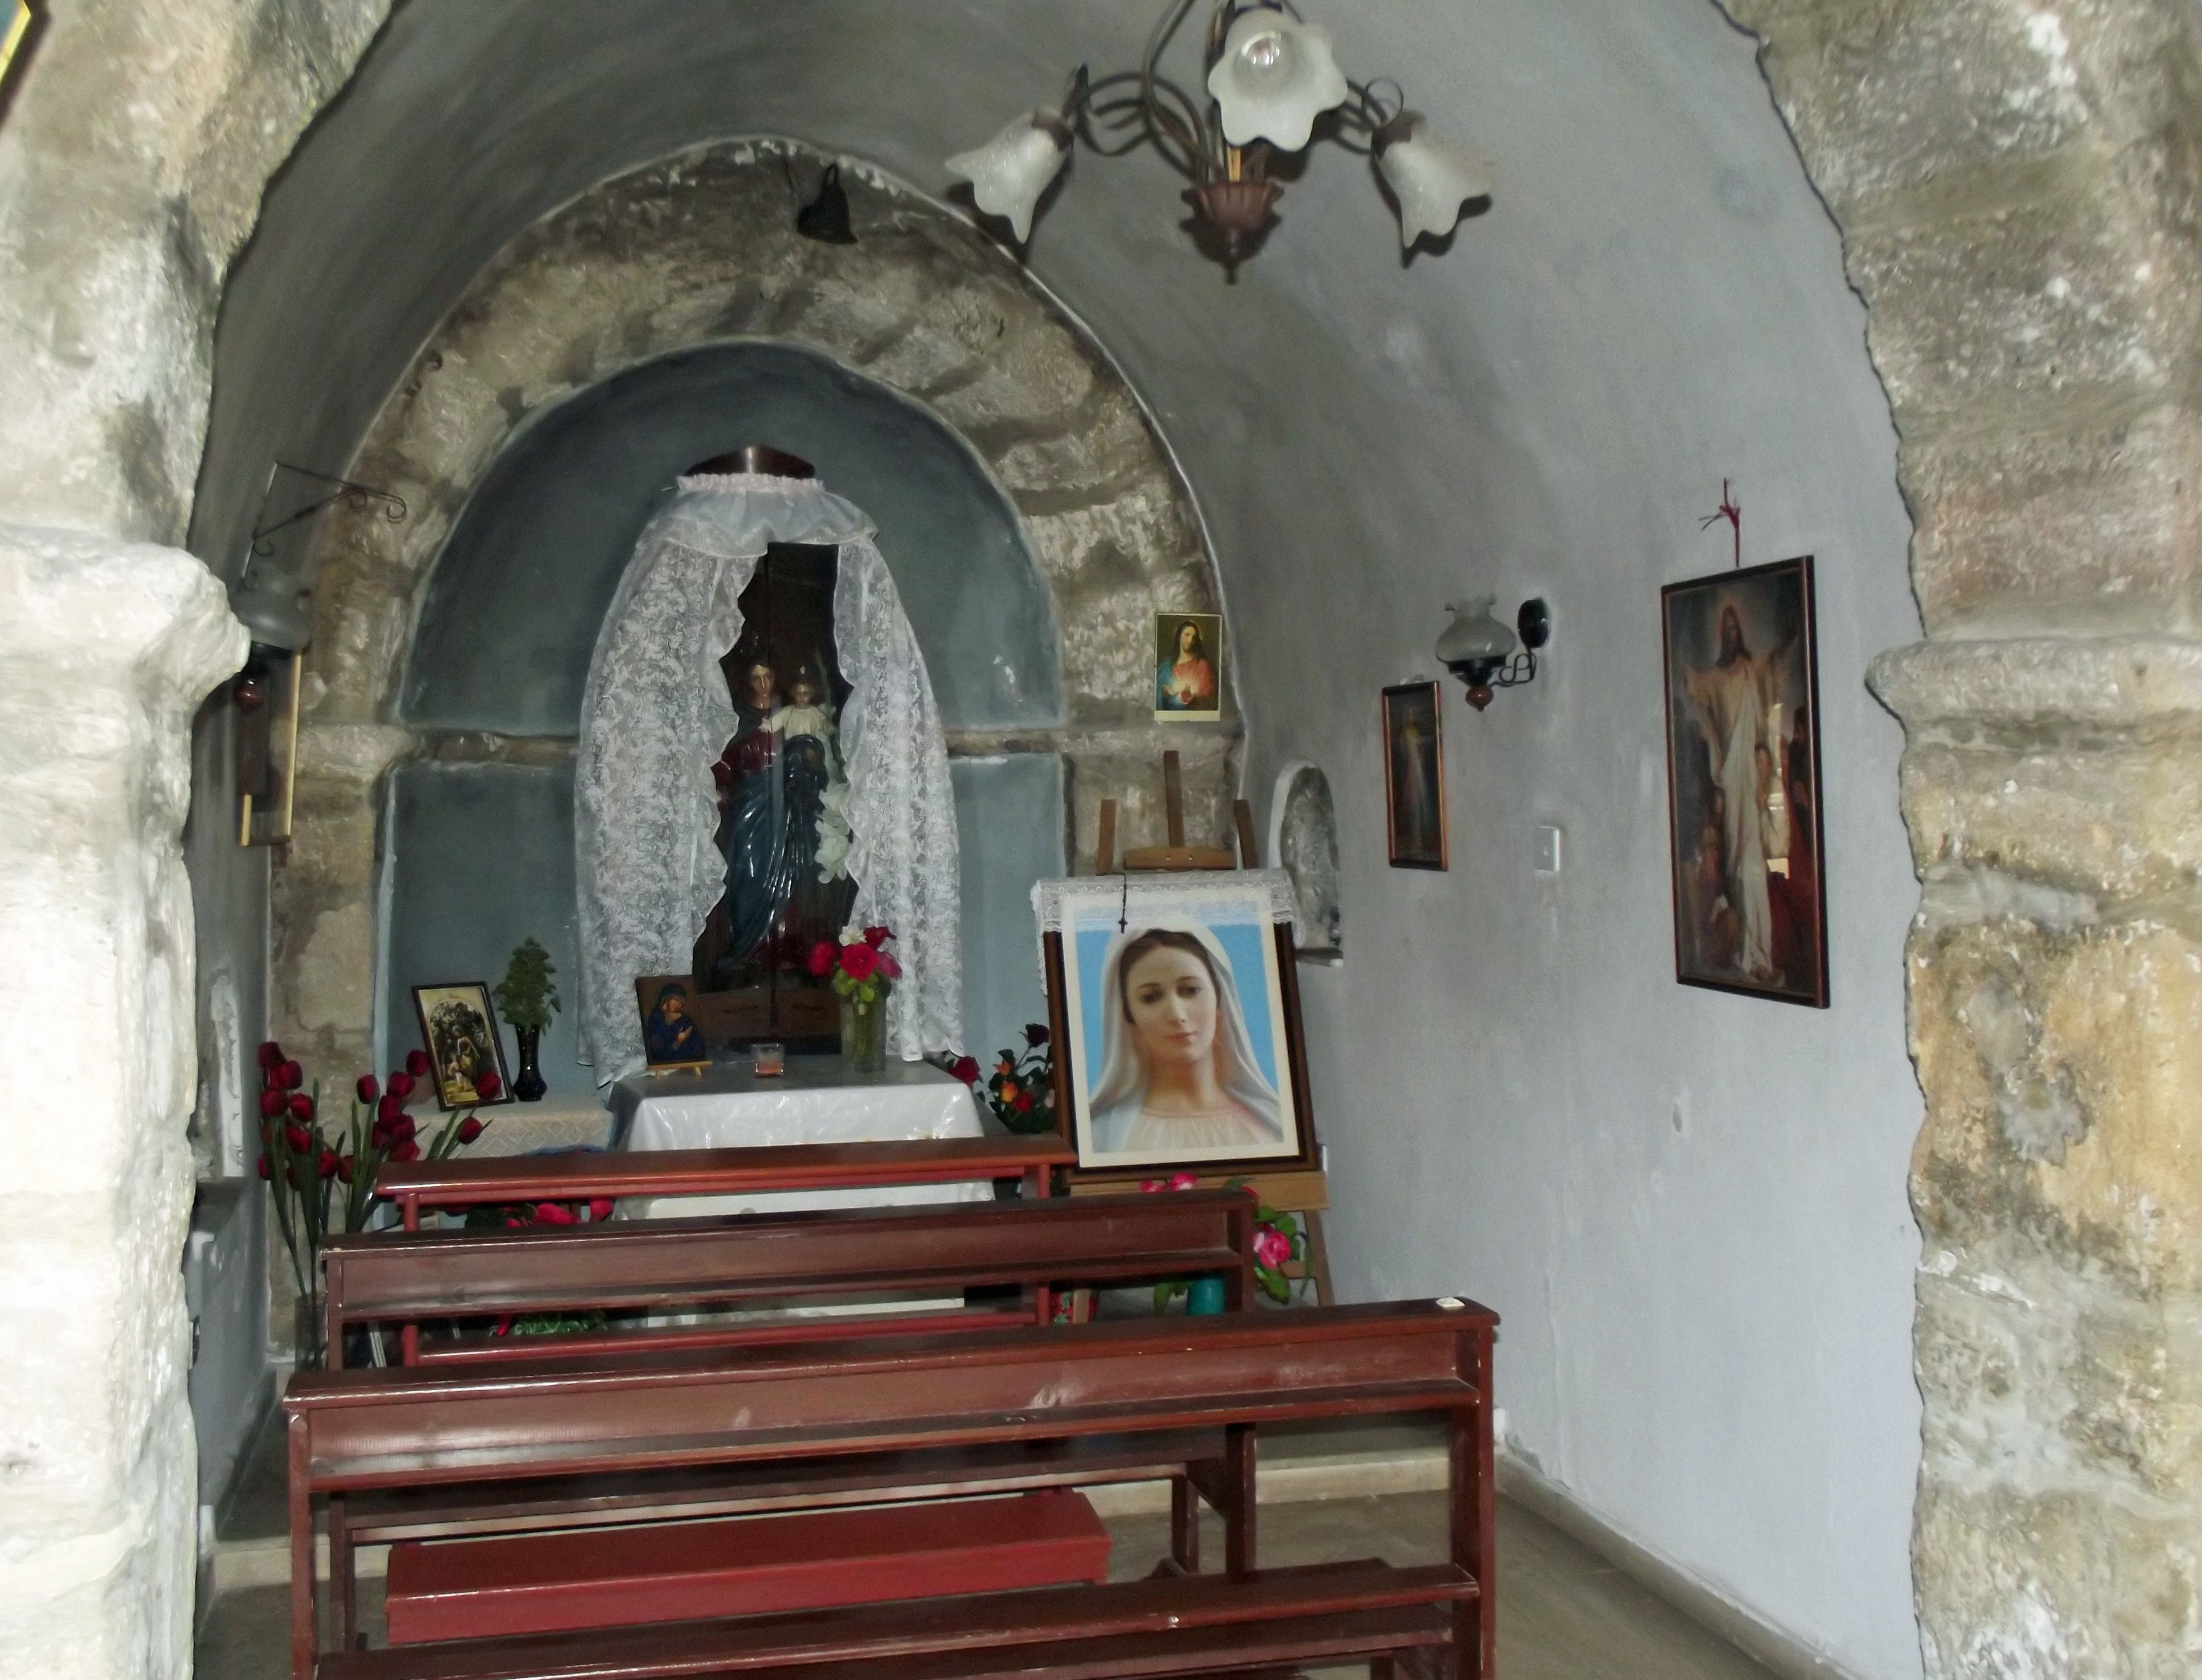 Koracom, North Cyprus